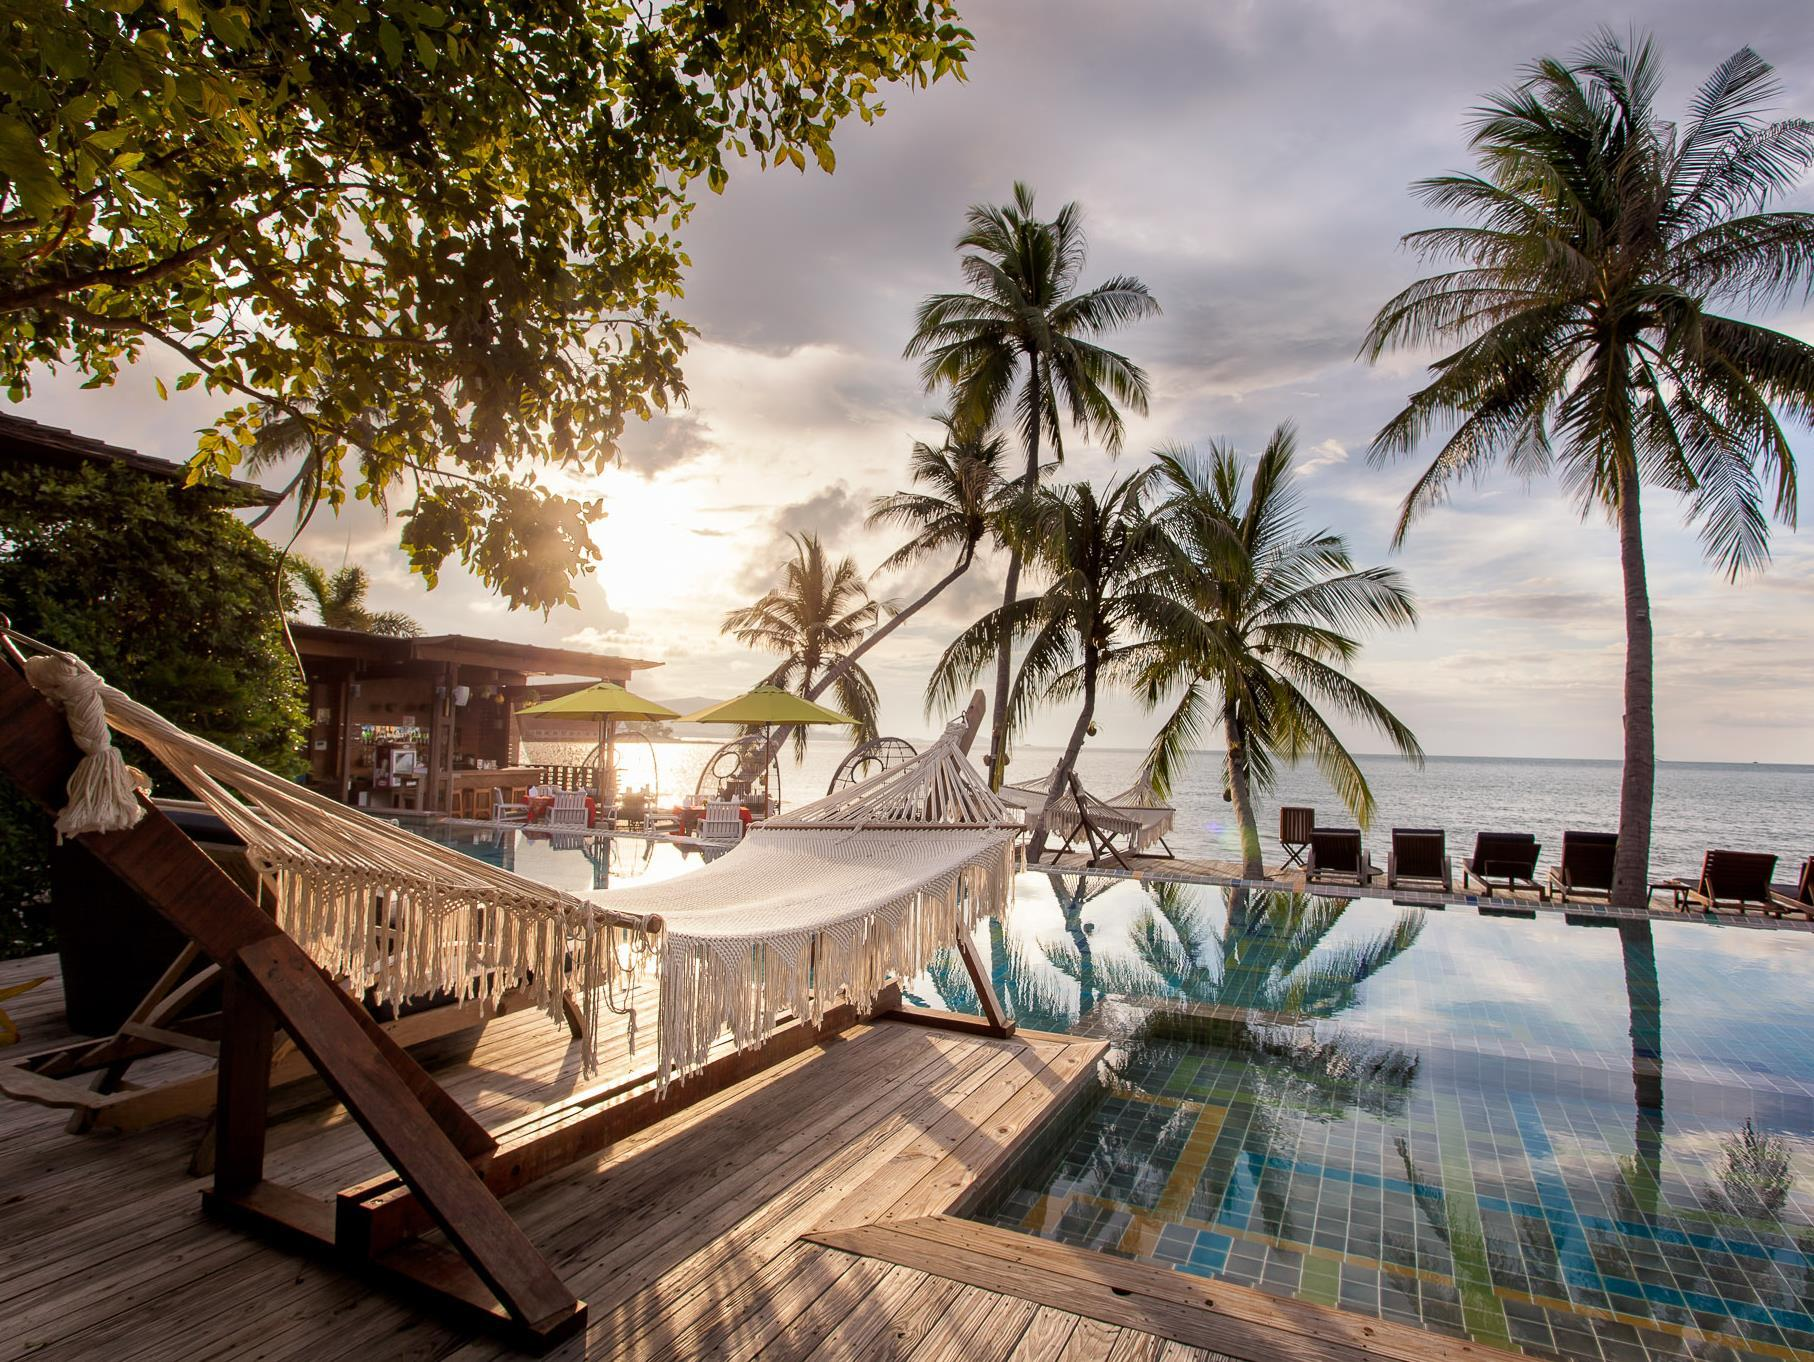 Best Price On Tango Luxe Samui Beach Villa In Samui + Reviews